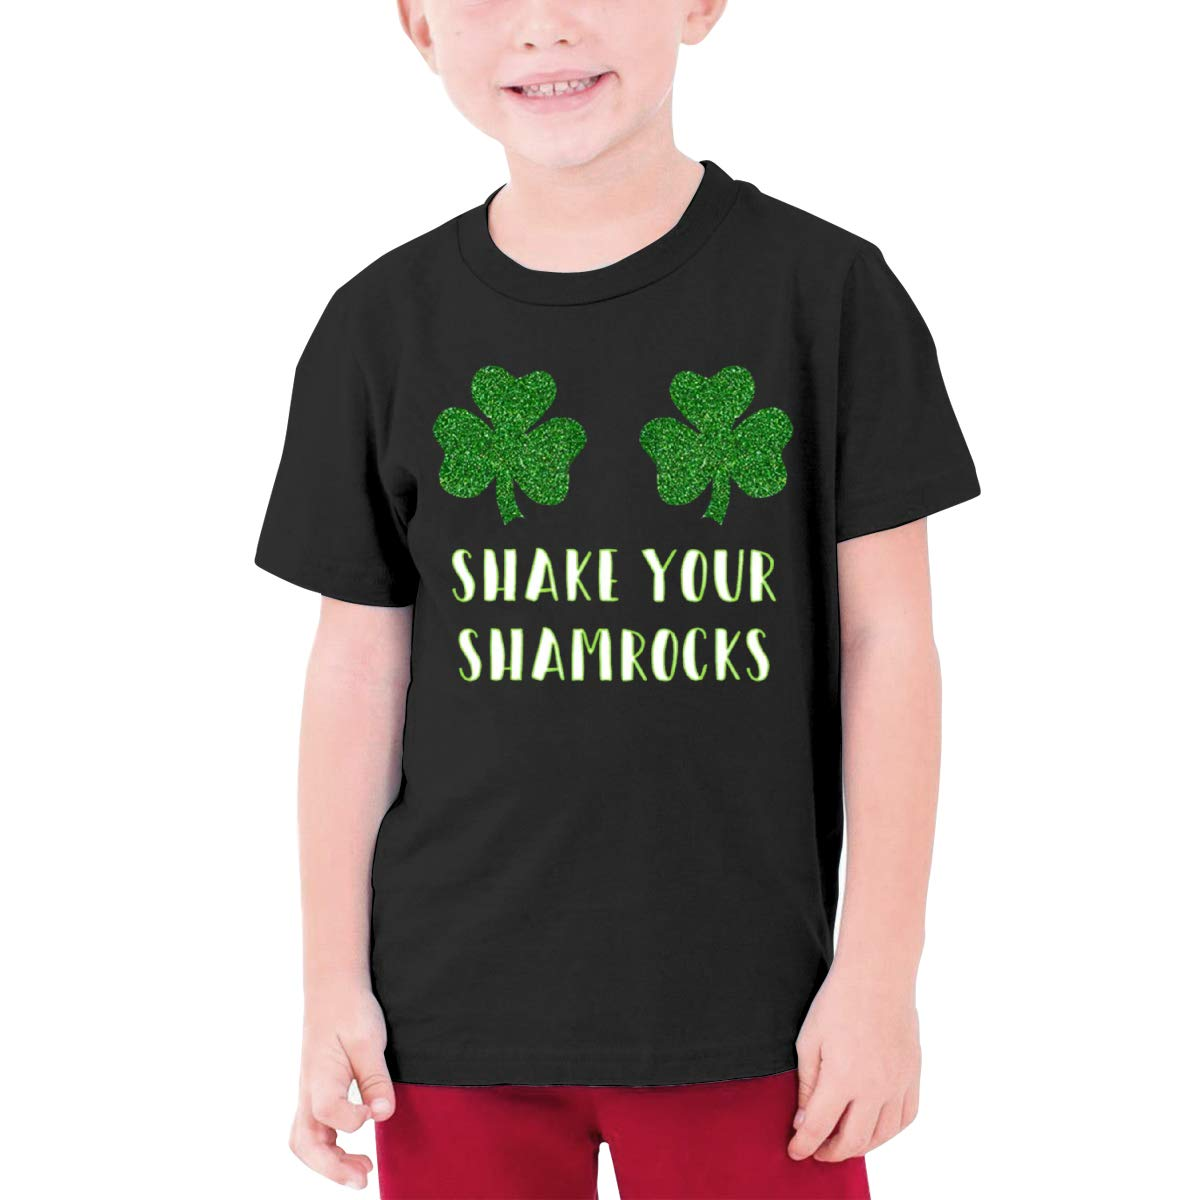 Negi Shake Your Shamrocks Boy Short-Sleeved Shirts